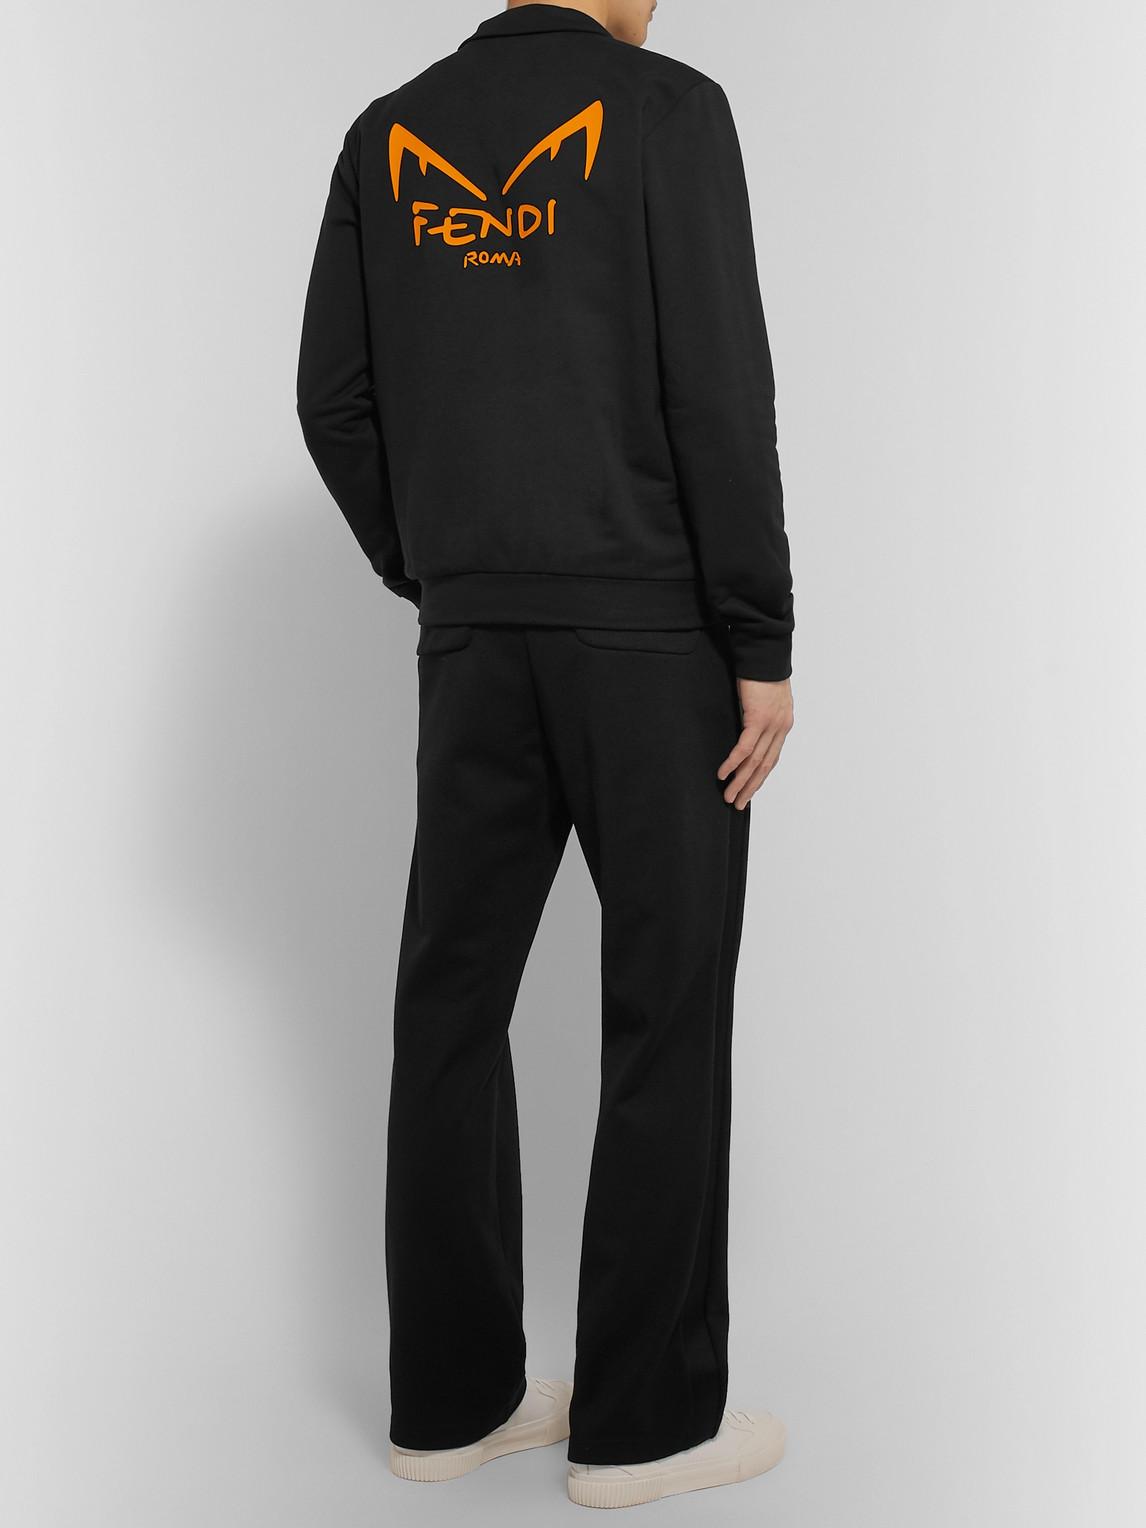 Fendi Jackets SLIM-FIT LOGO-DETAIL COTTON-JERSEY TRACK JACKET